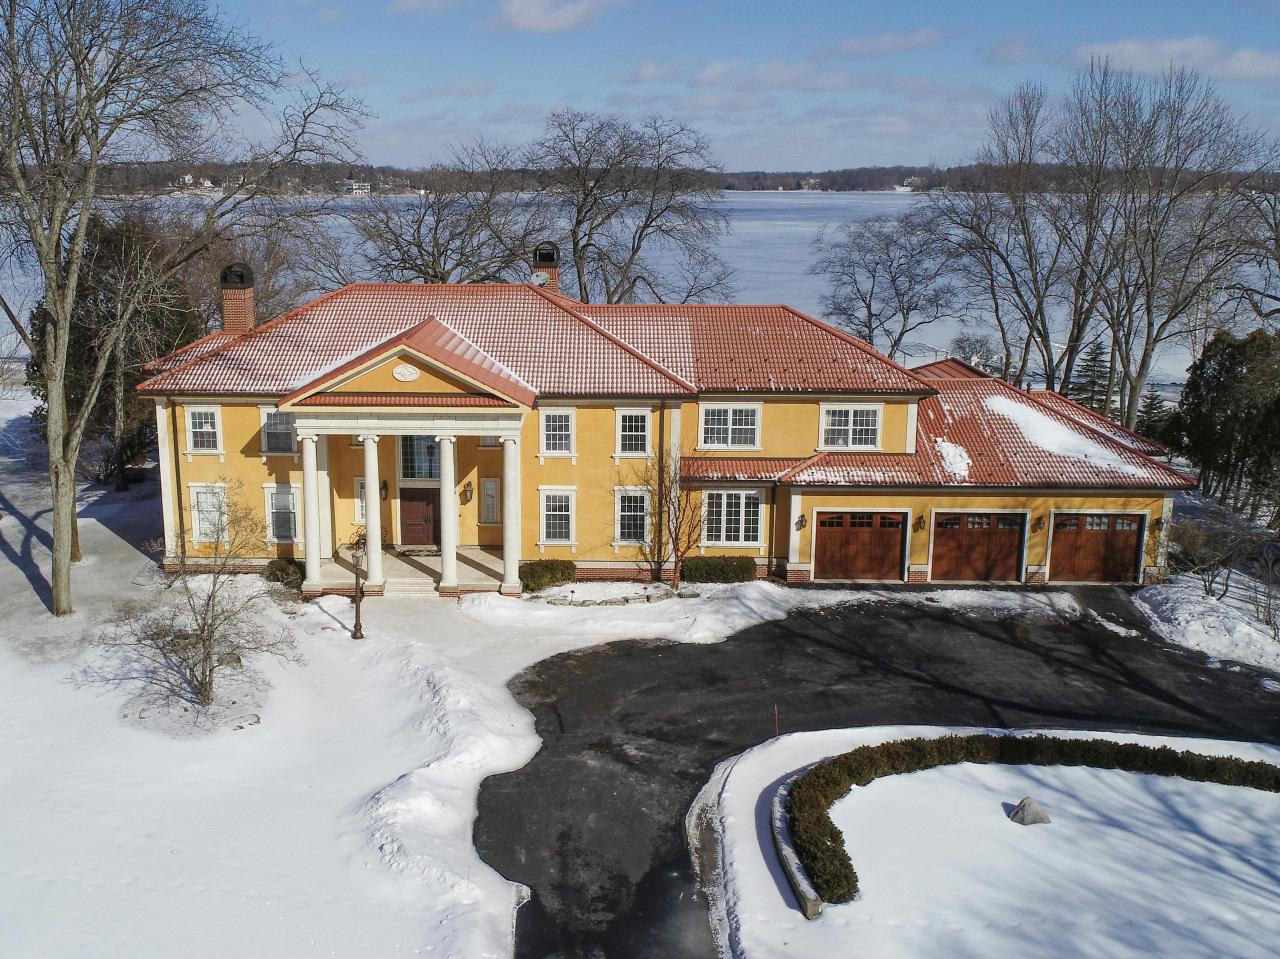 36234 Beach Rd, Oconomowoc Lake, Wisconsin 53066, 4 Bedrooms Bedrooms, 18 Rooms Rooms,4 BathroomsBathrooms,Single-Family,For Sale,Beach Rd,1655207